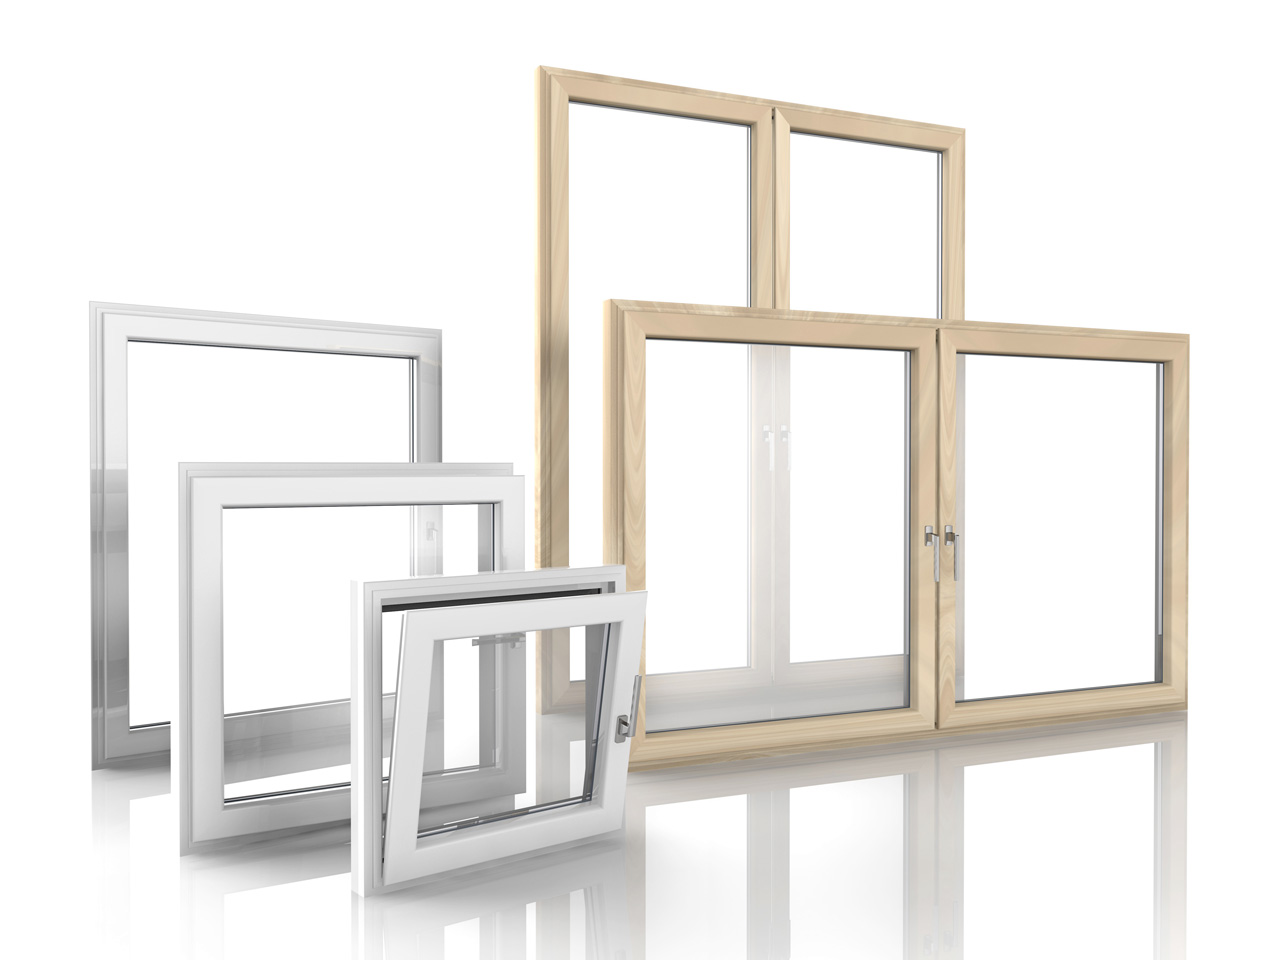 Fenster Holzfenster Kunststofffenster Alufenster